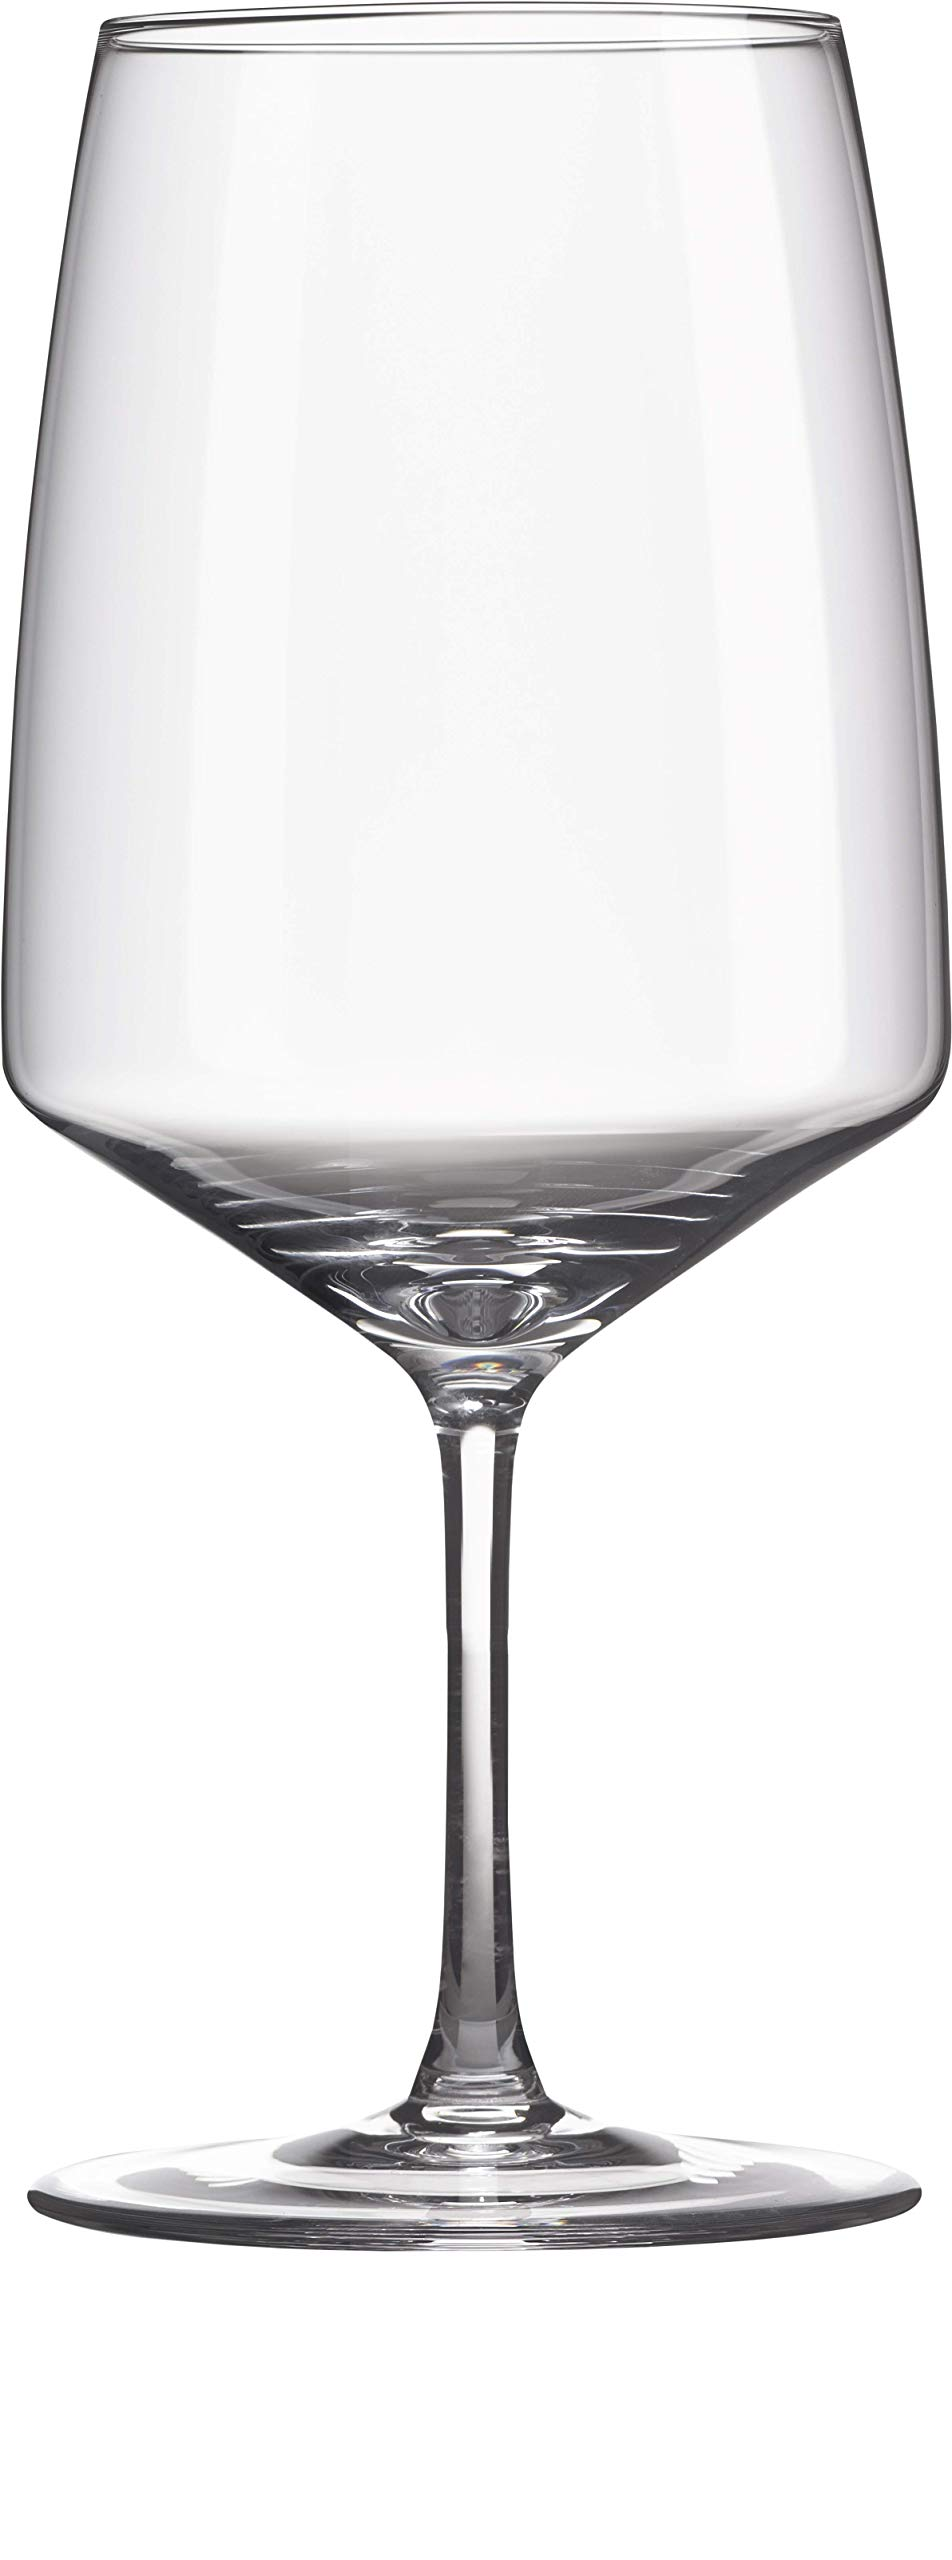 RONA Vista All-Purpose Water Glass 17 oz. by RONA (Image #1)